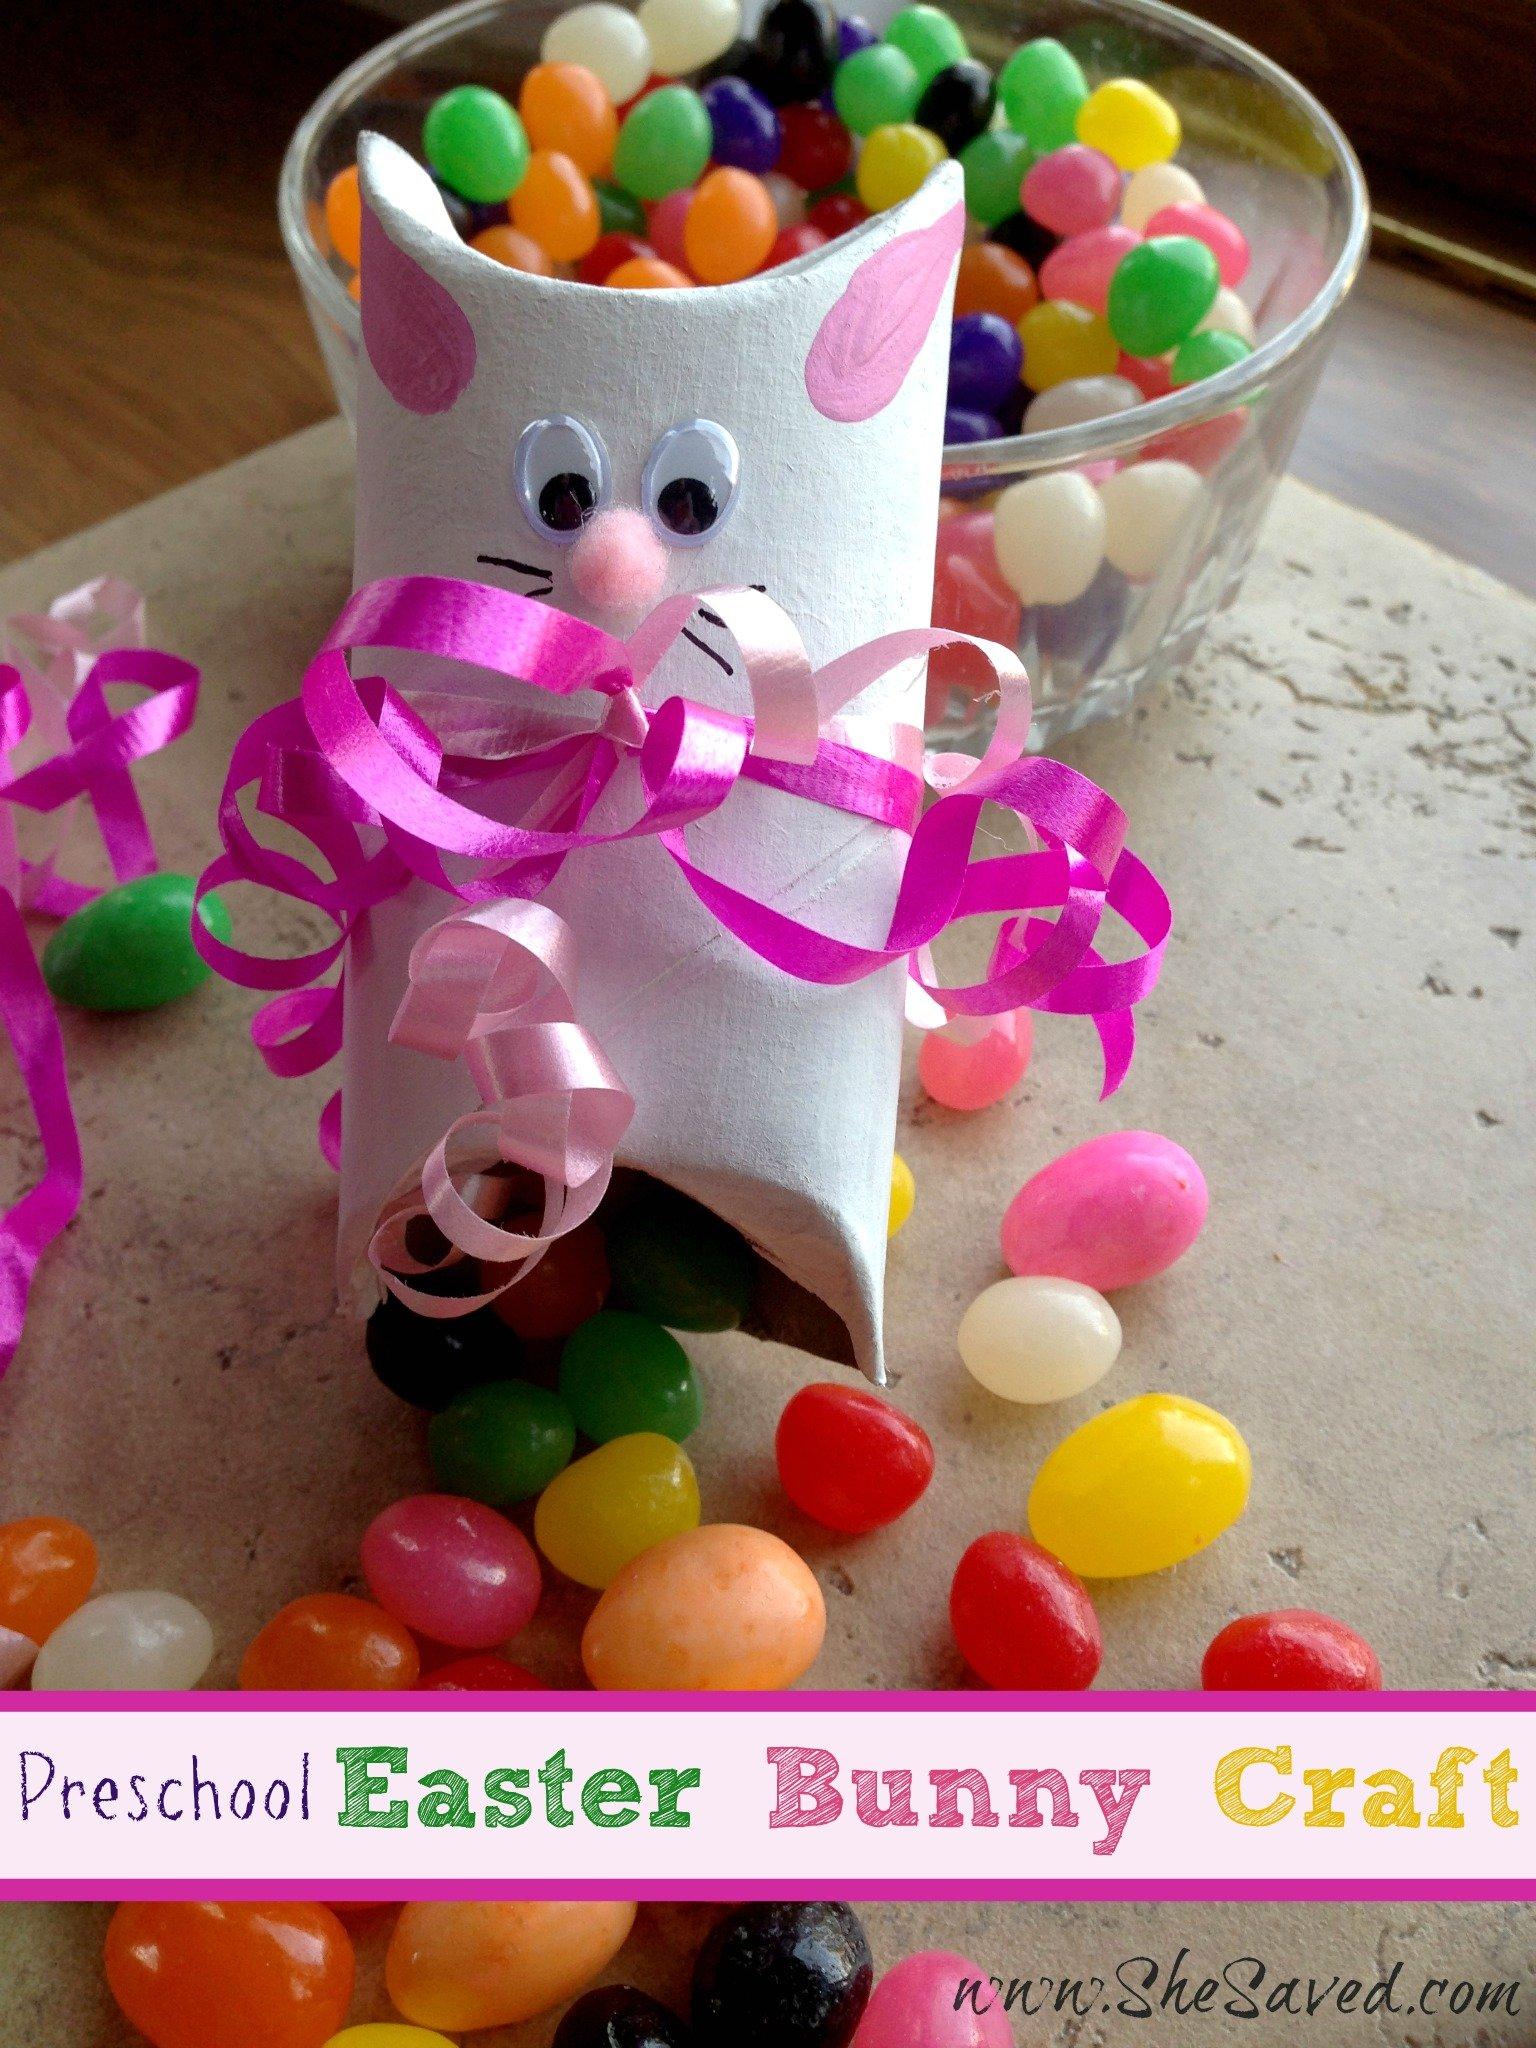 Preschool easter bunny crafts shesaved for Easter craft for preschool